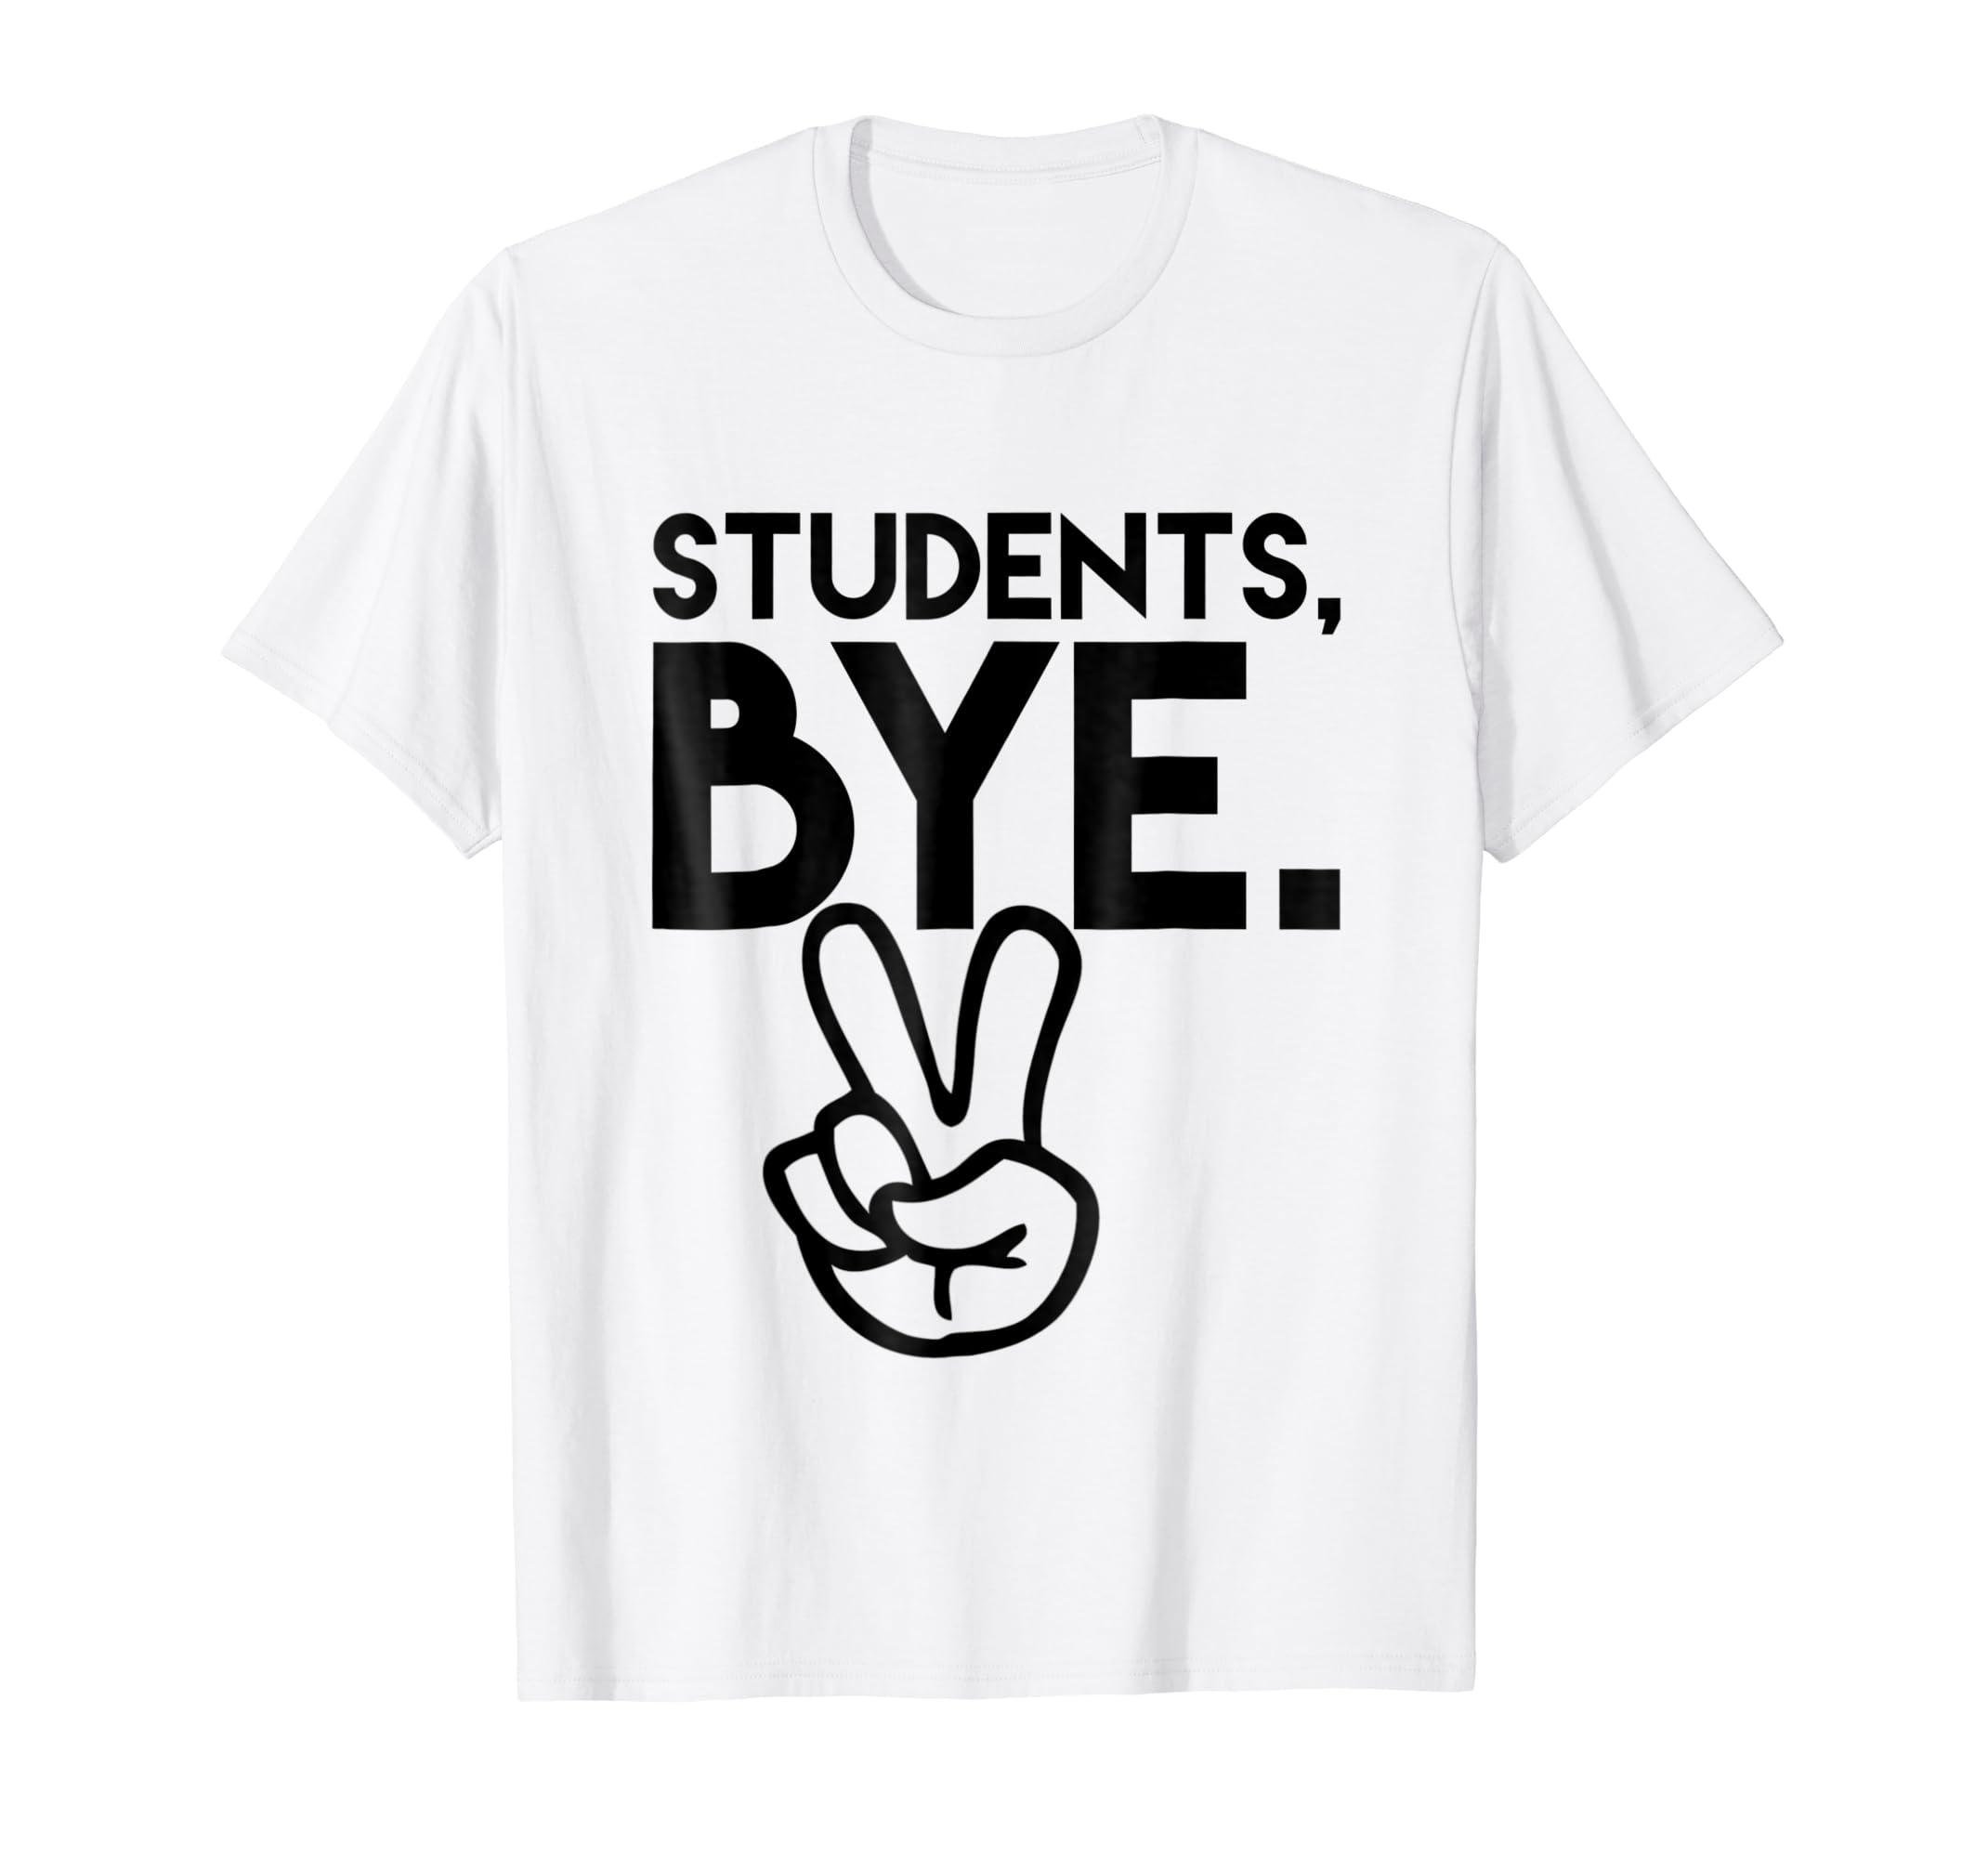 3e6cc356 Amazon.com: Students, Bye. Funny Last Day of School Teacher TShirts ...